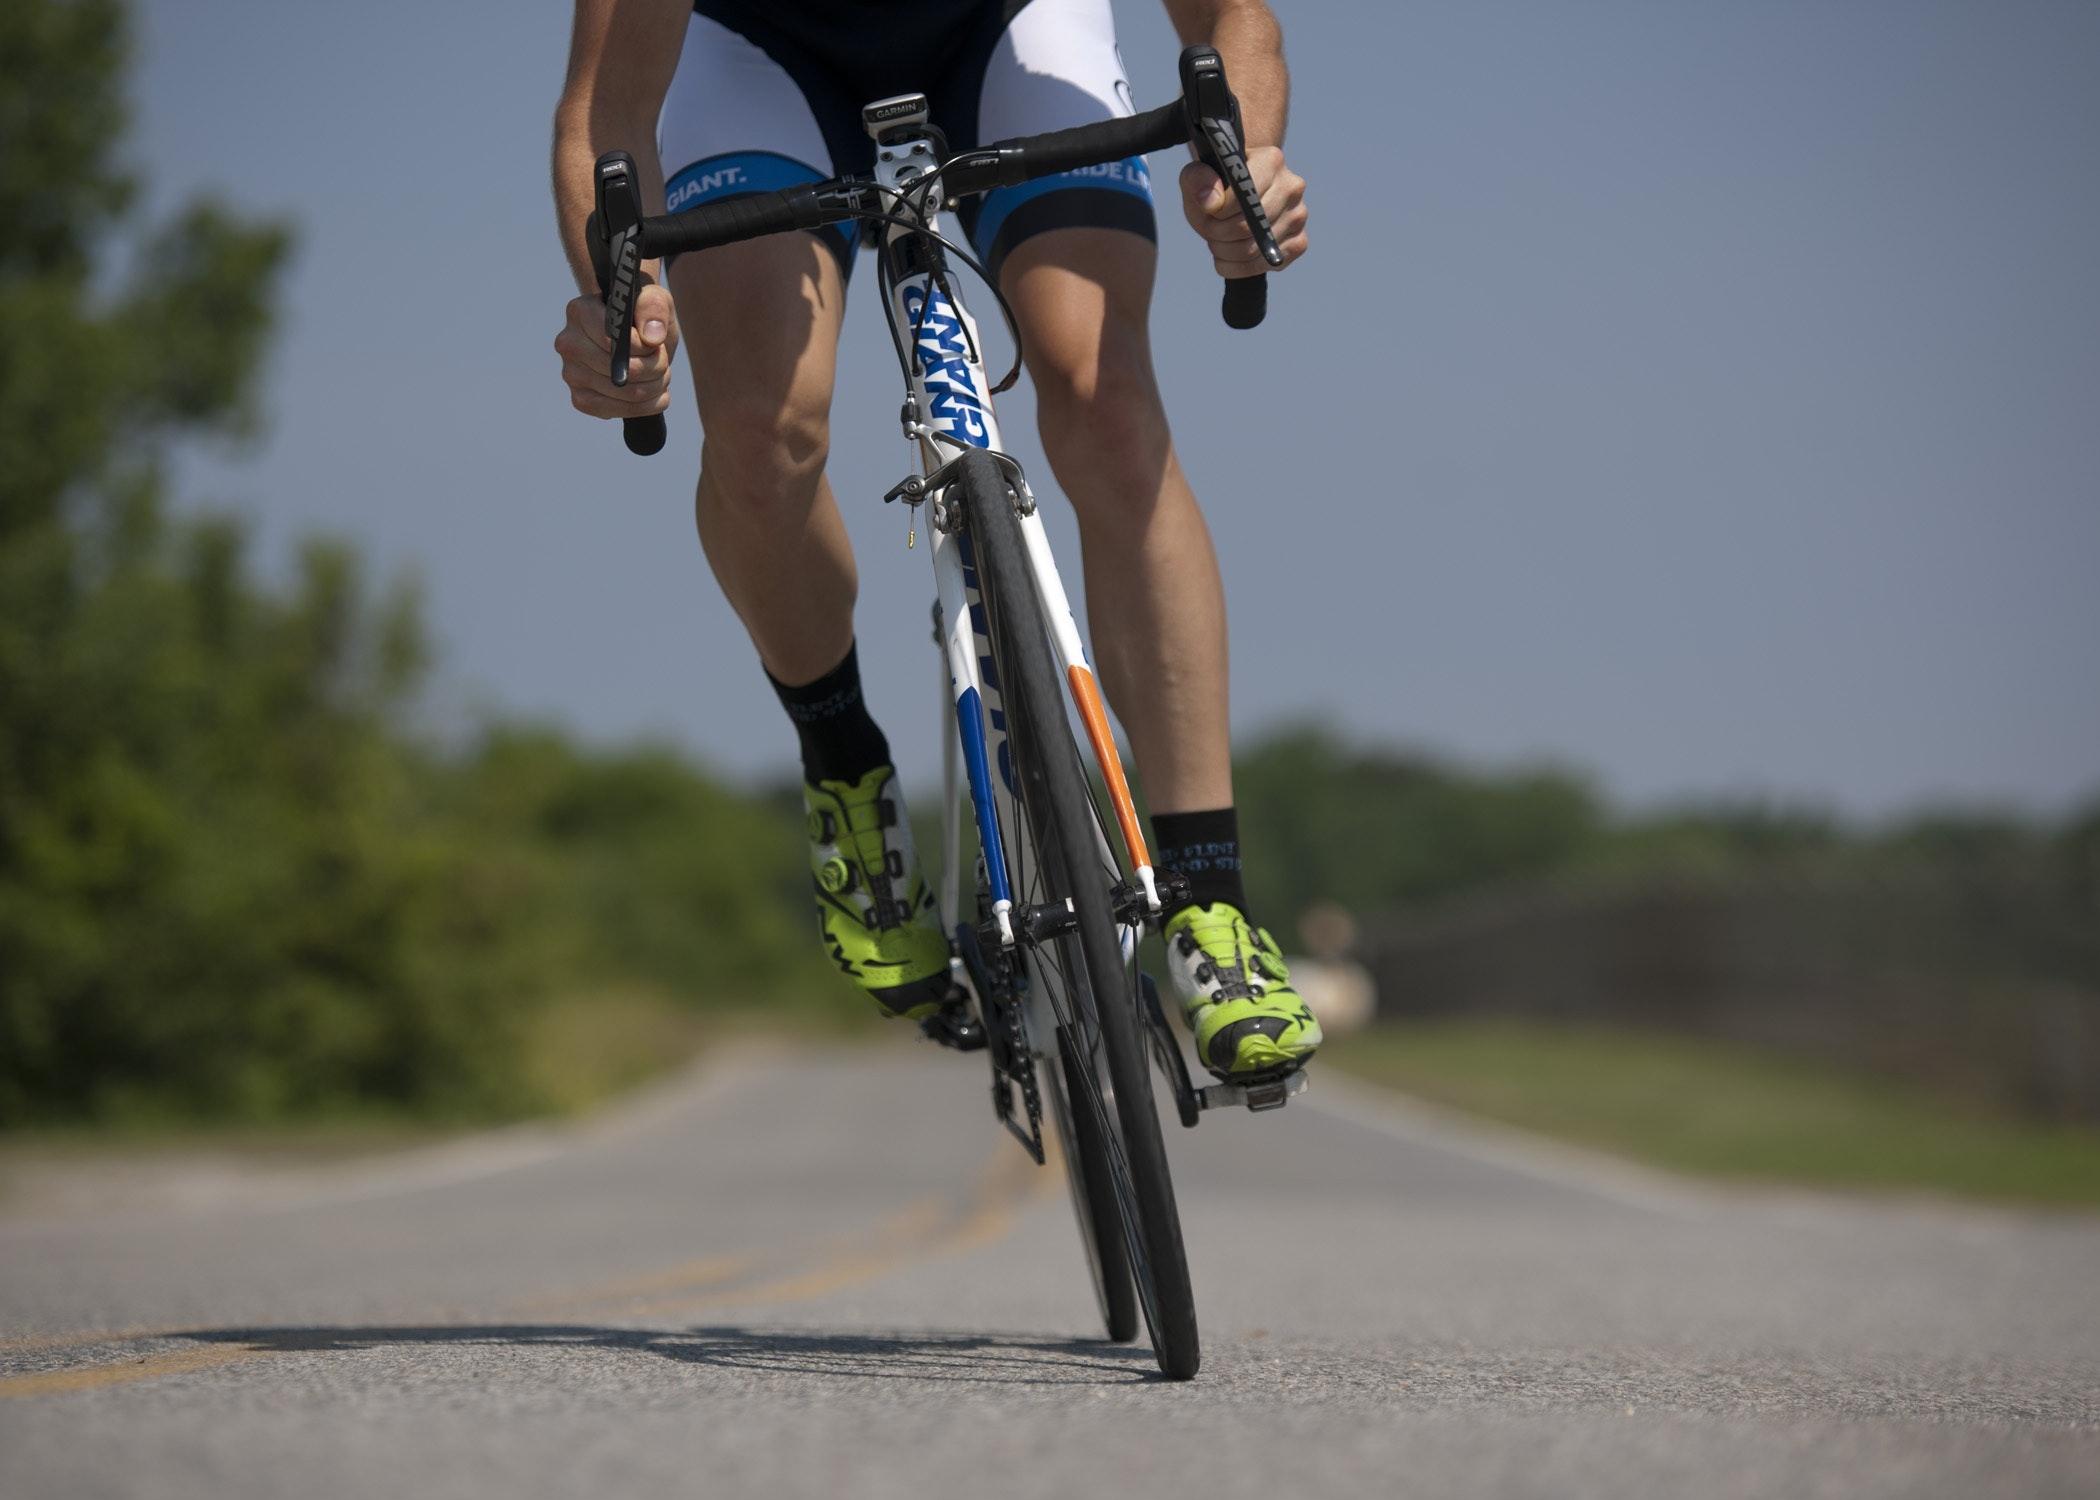 bike ride to raise money for church planting